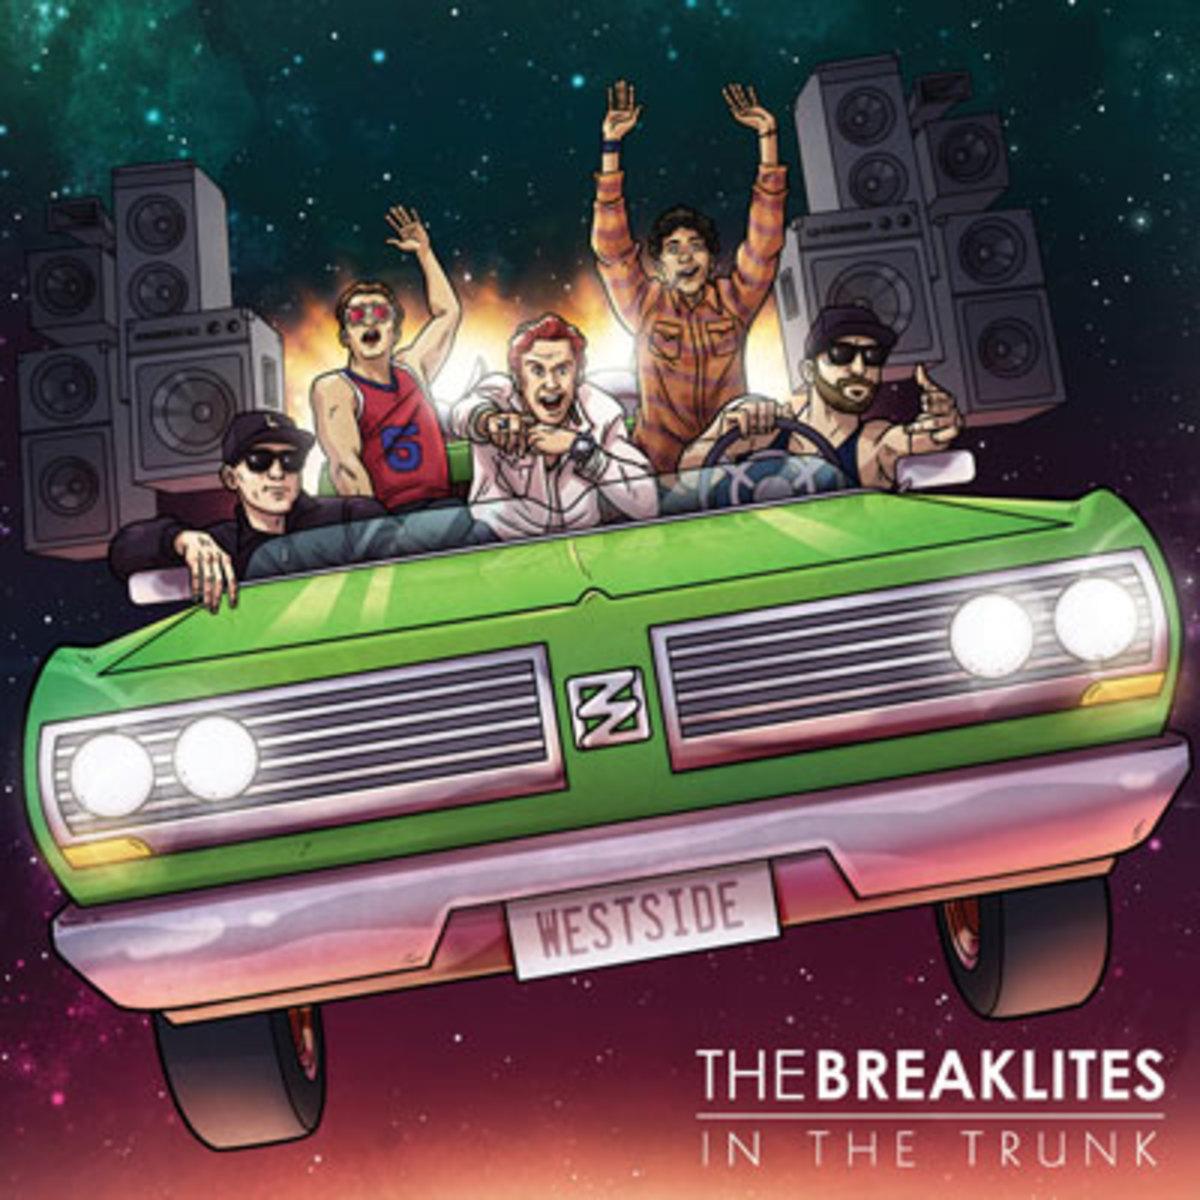 thebreaklites-inthetrunk.jpg